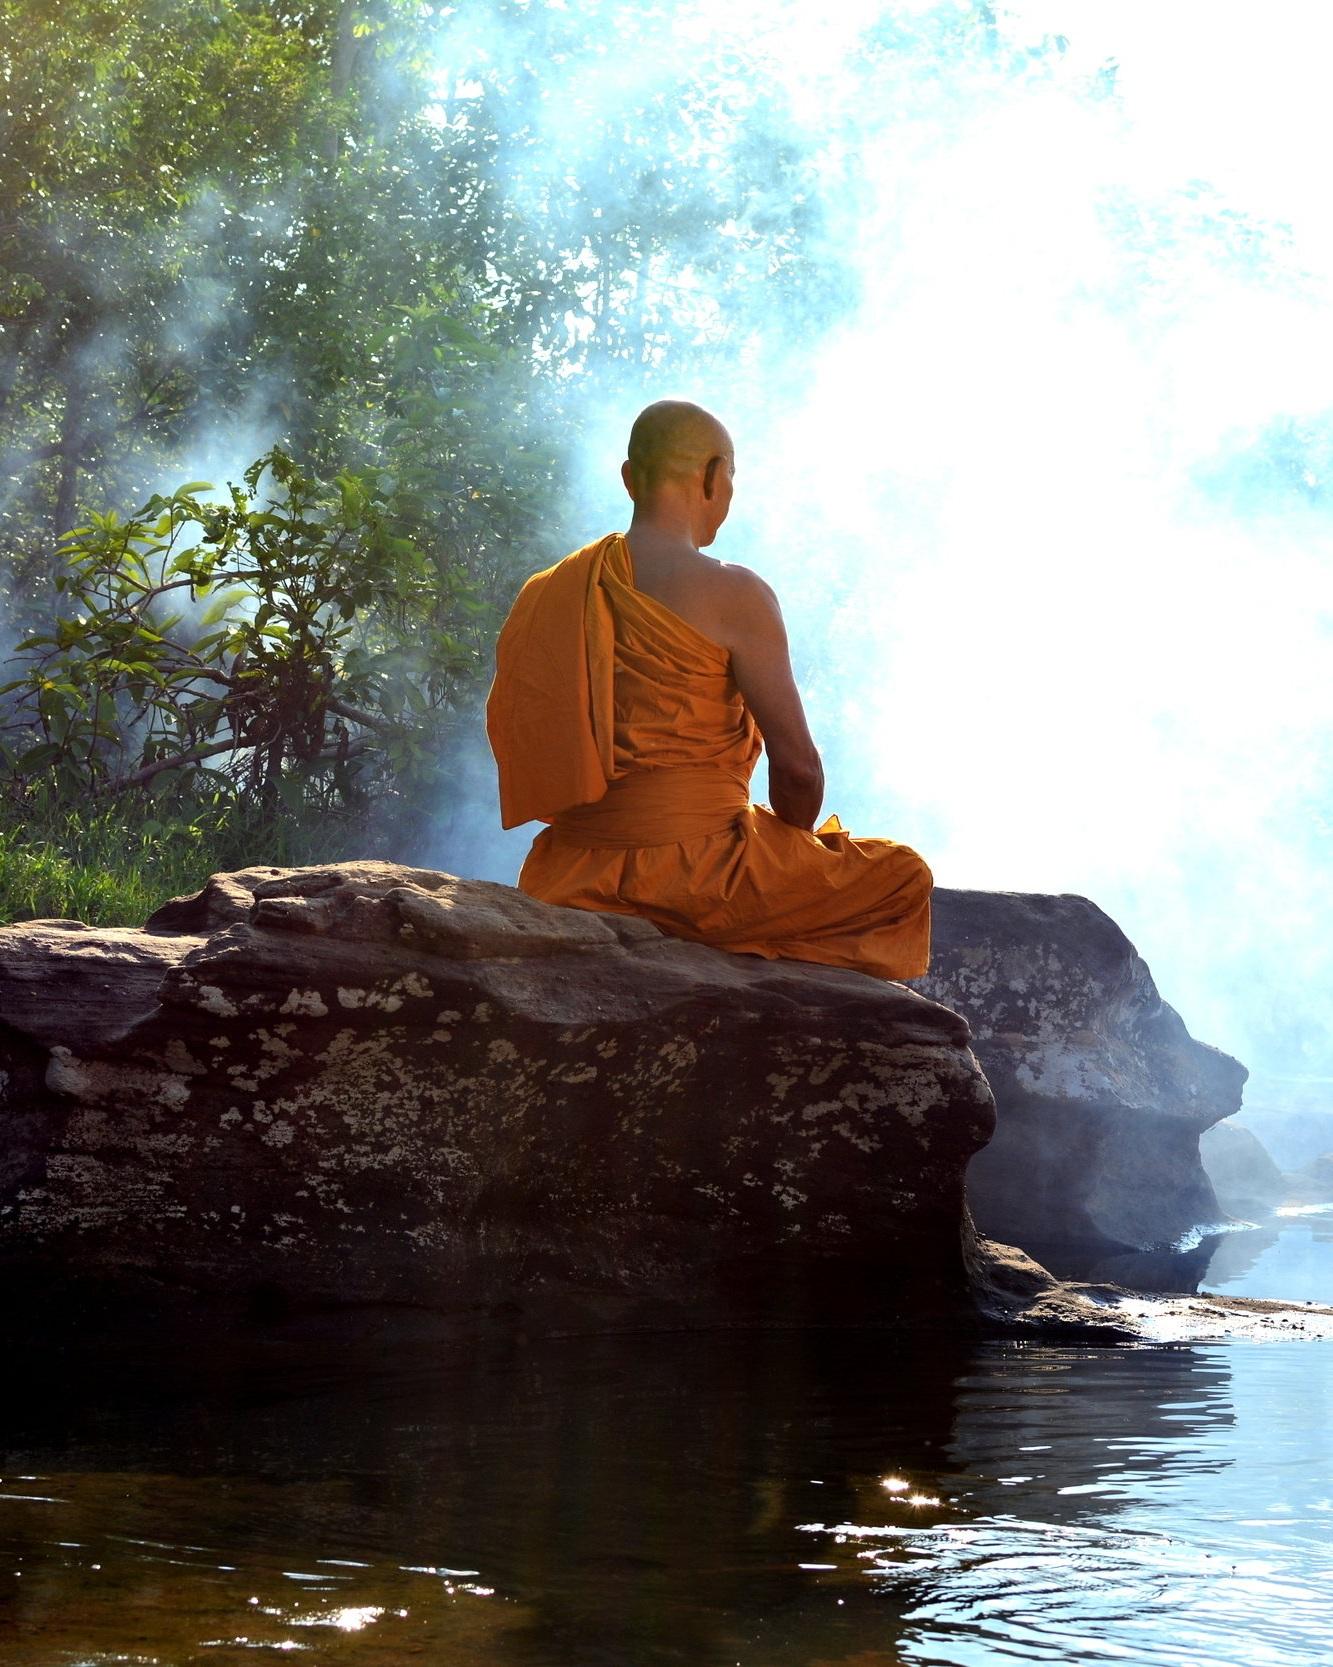 Buddhist+Monk+on+Rock.jpg